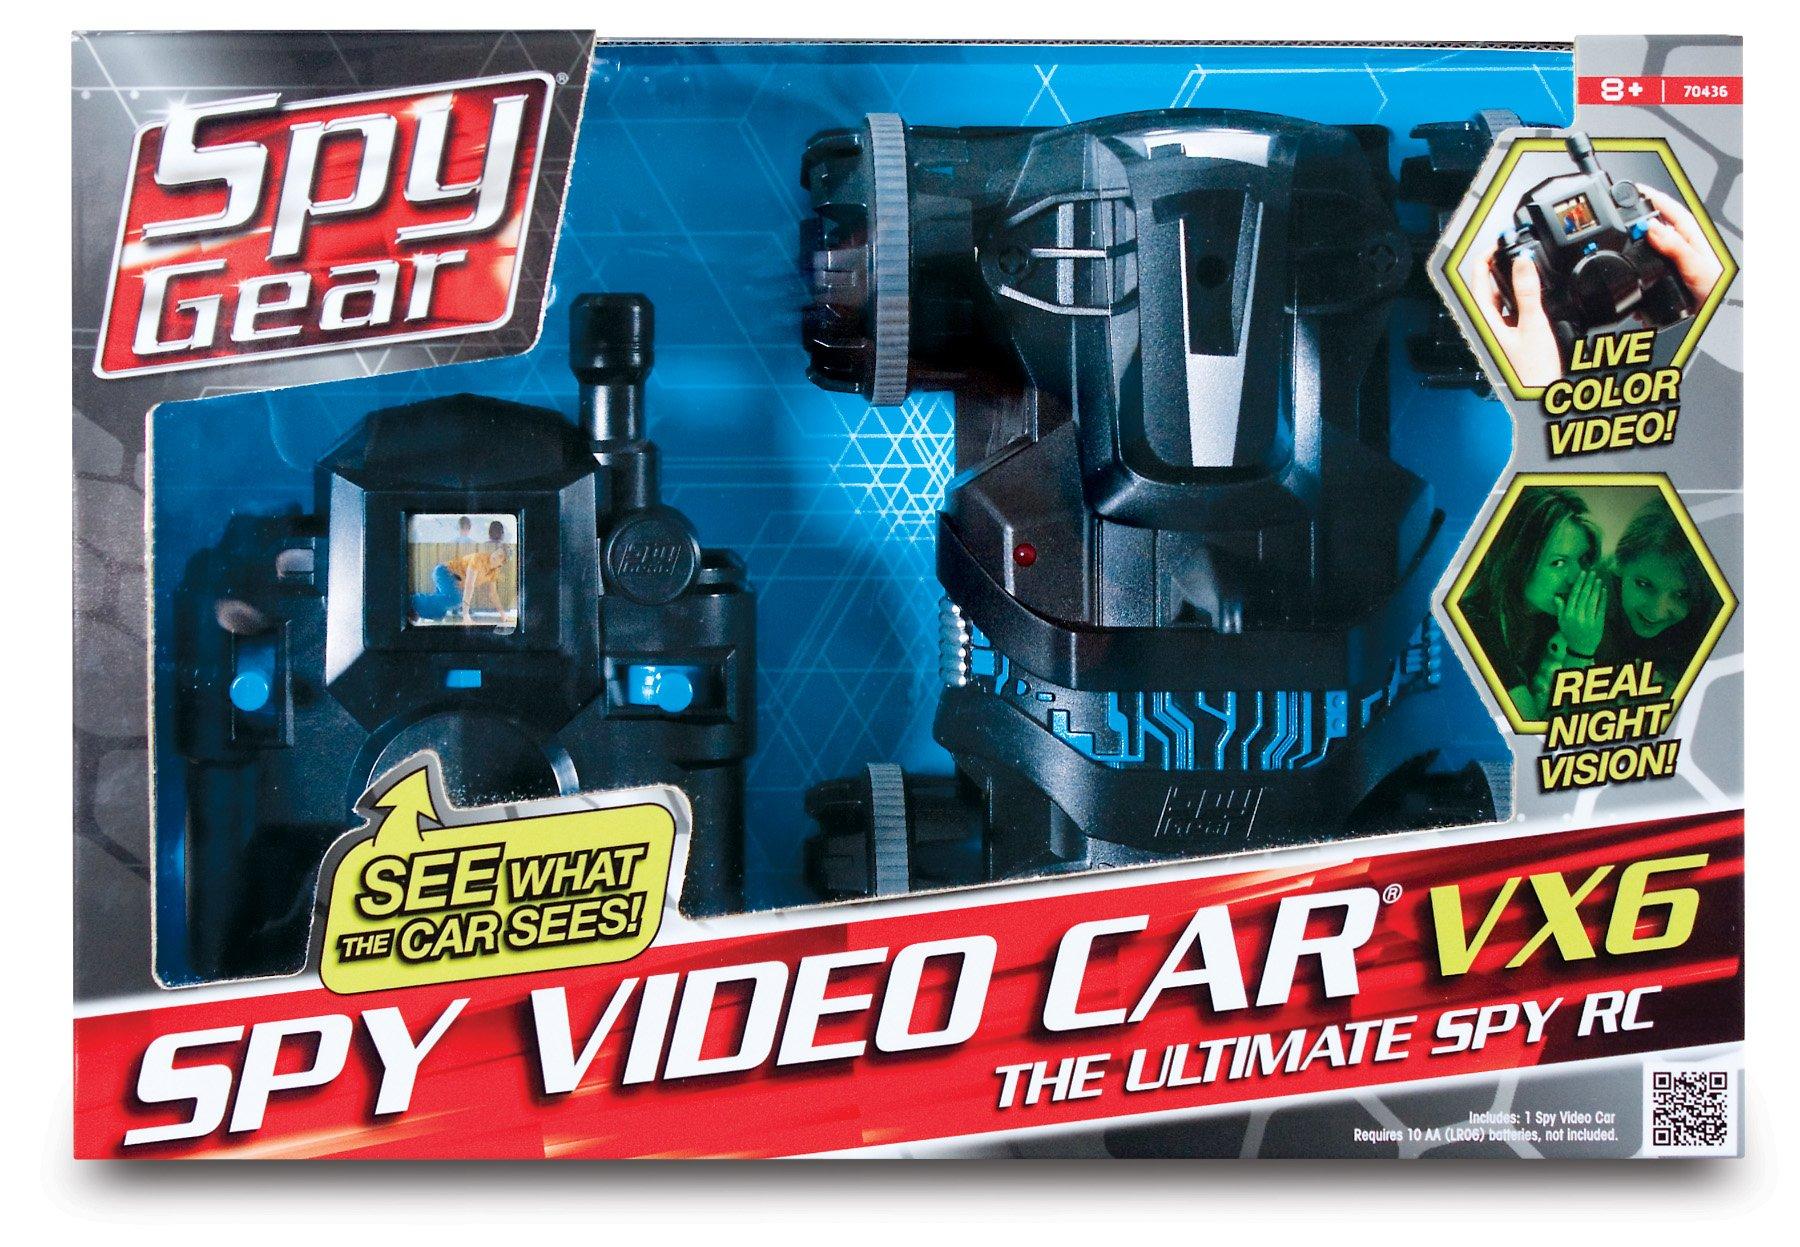 Spy Gear Spy Video Car VX-6 by Spy Gear (Image #4)